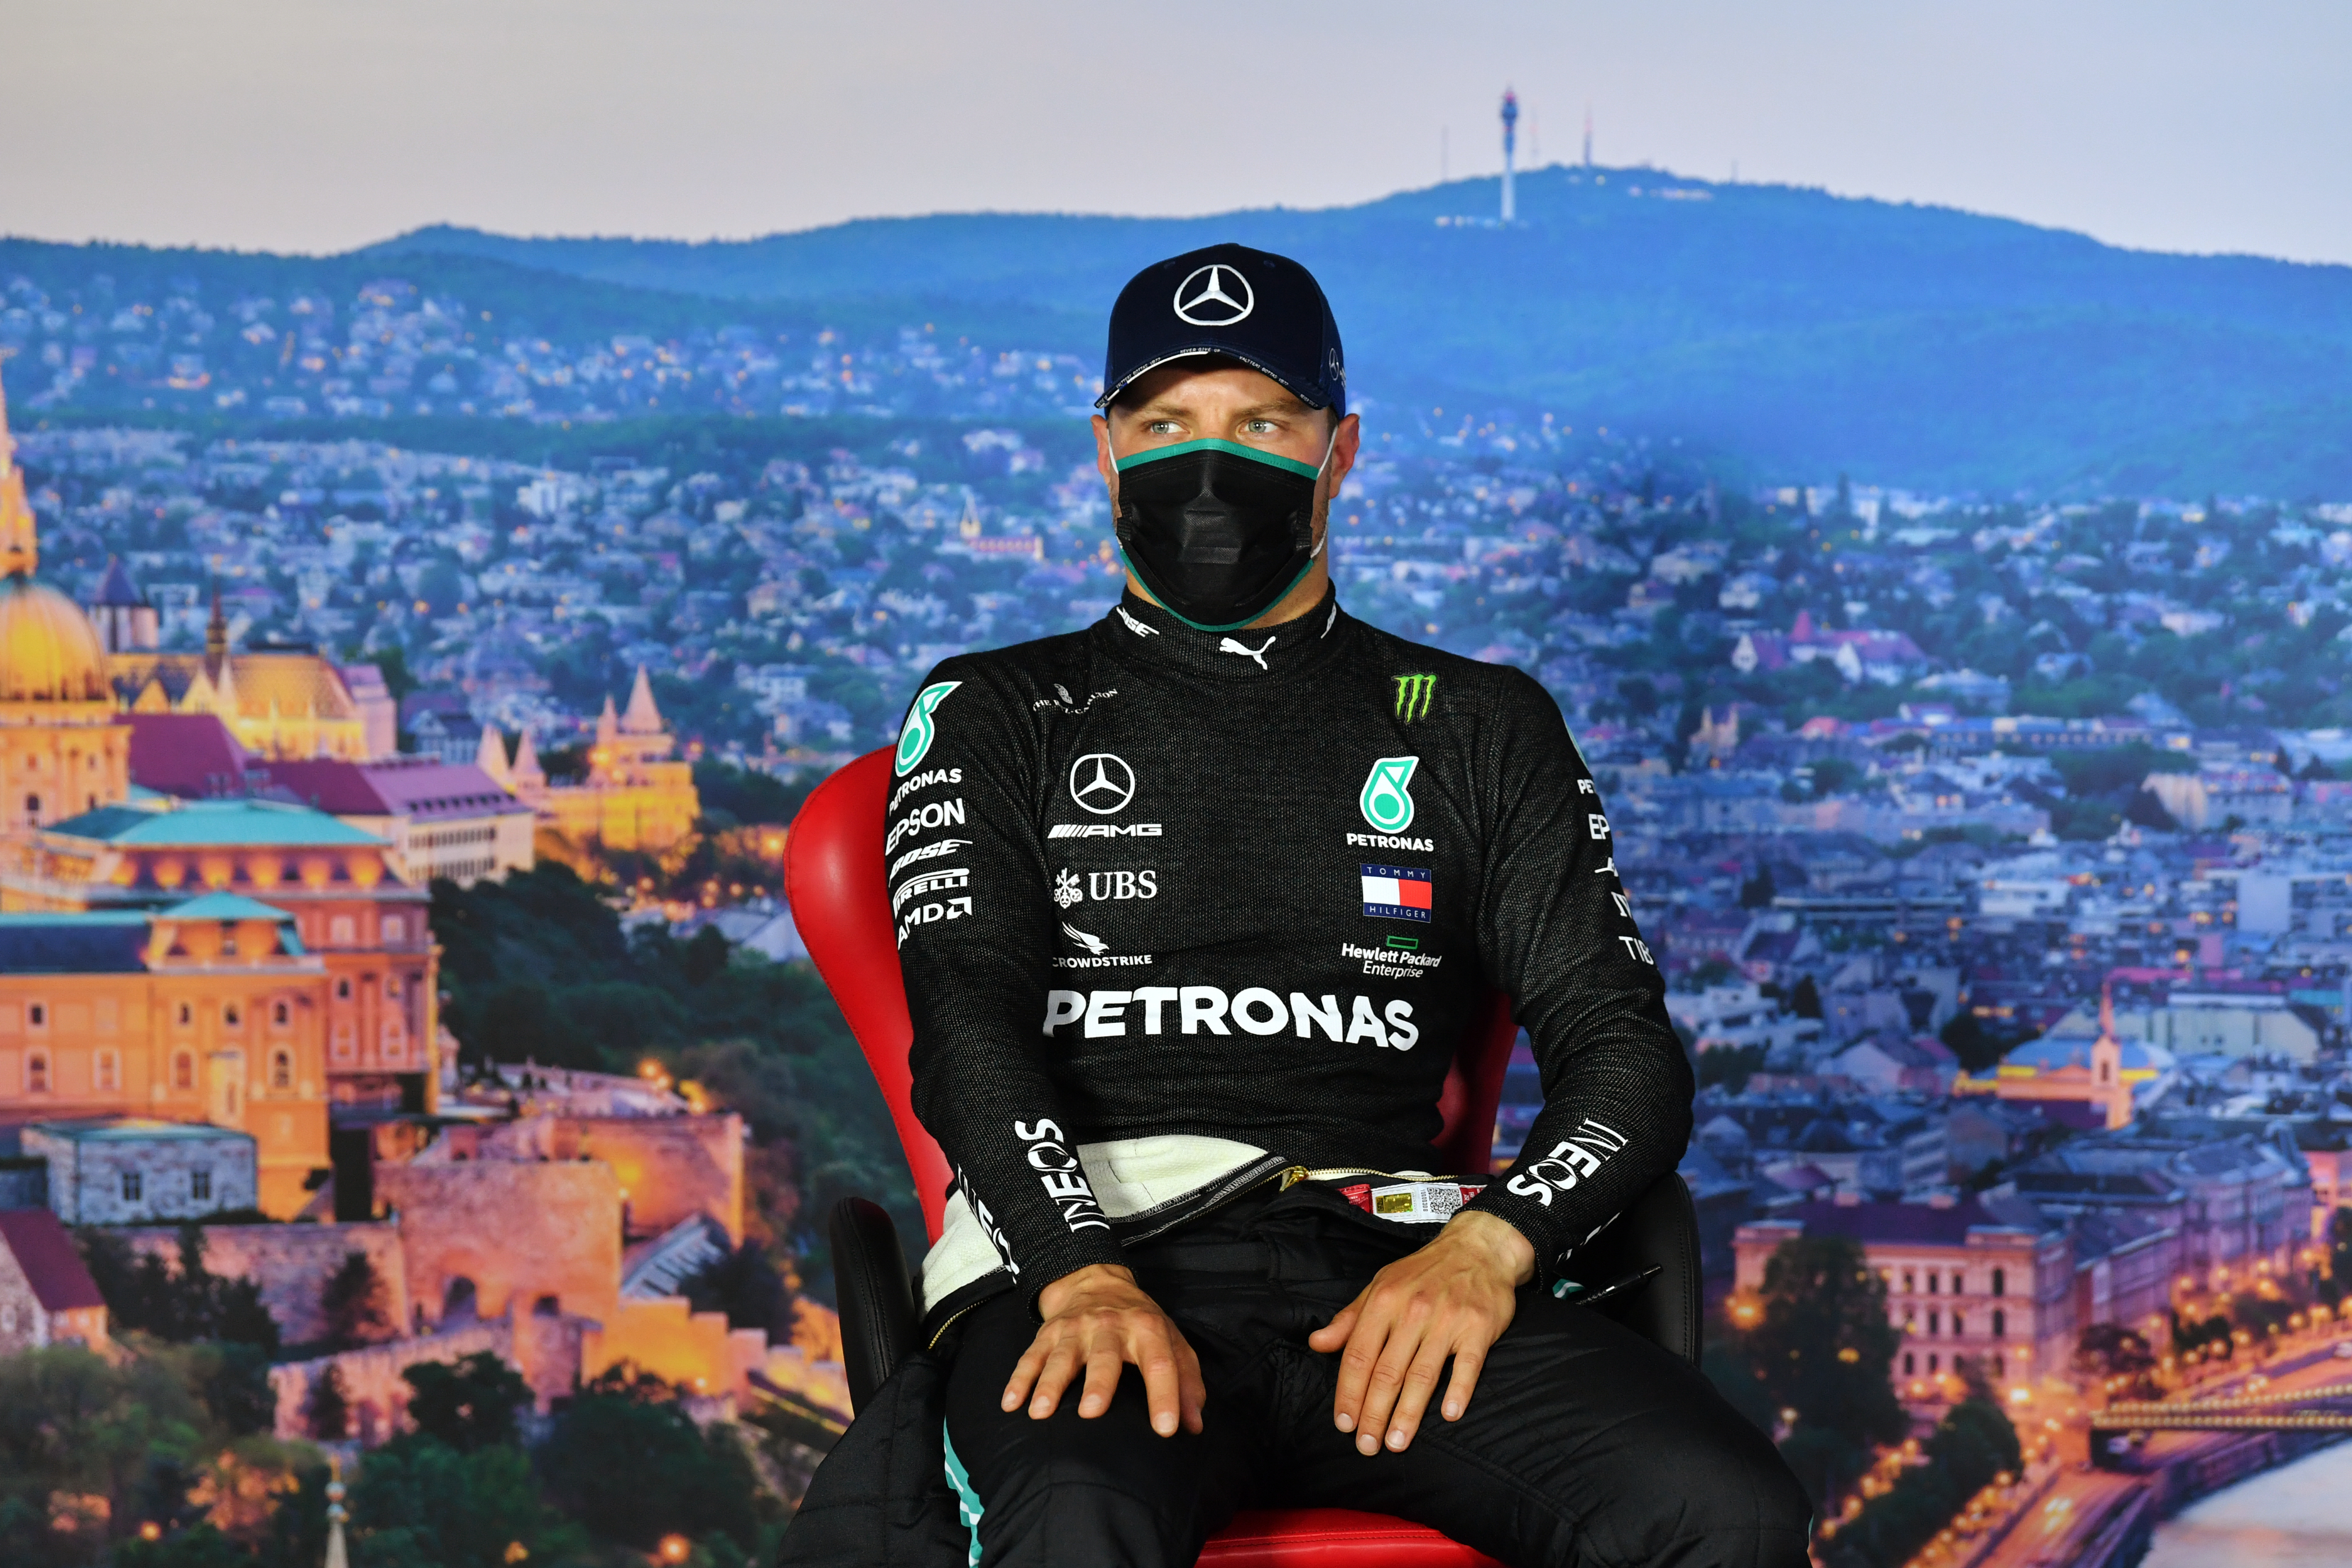 Motor Racing Formula One World Championship Hungarian Grand Prix Qualifying Day Budapest, Hungary